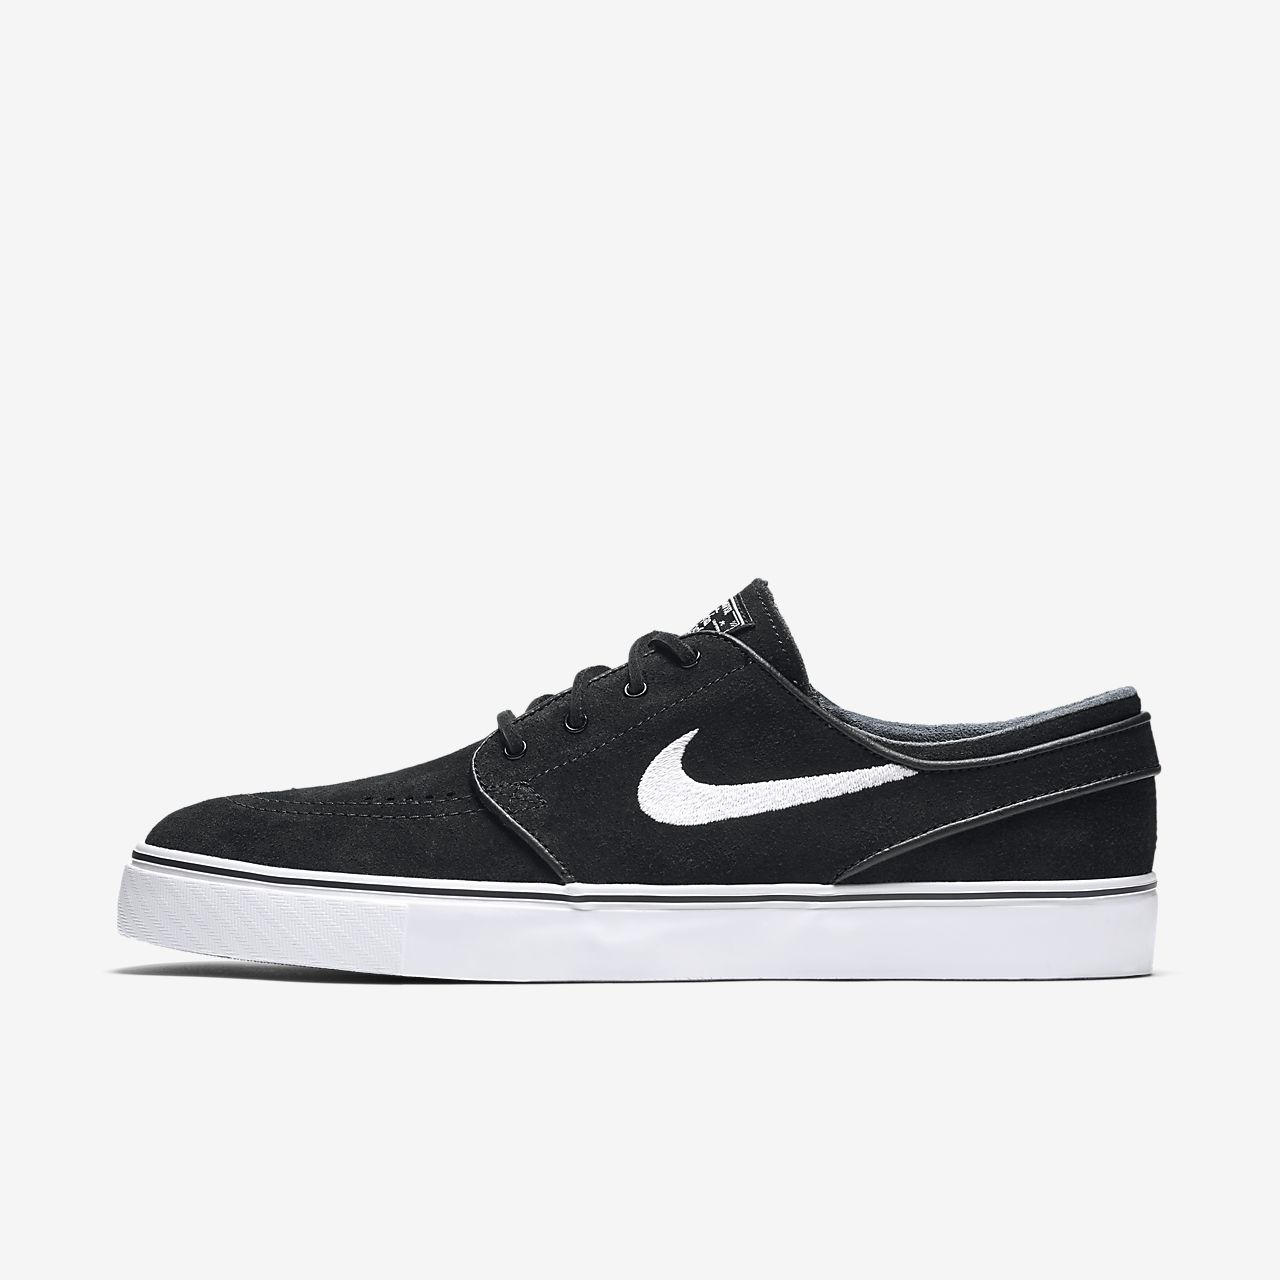 free shipping 4ca0b eee3b Nike SB Zoom Stefan Janoski OG-skatersko til mænd. Nike.com DK